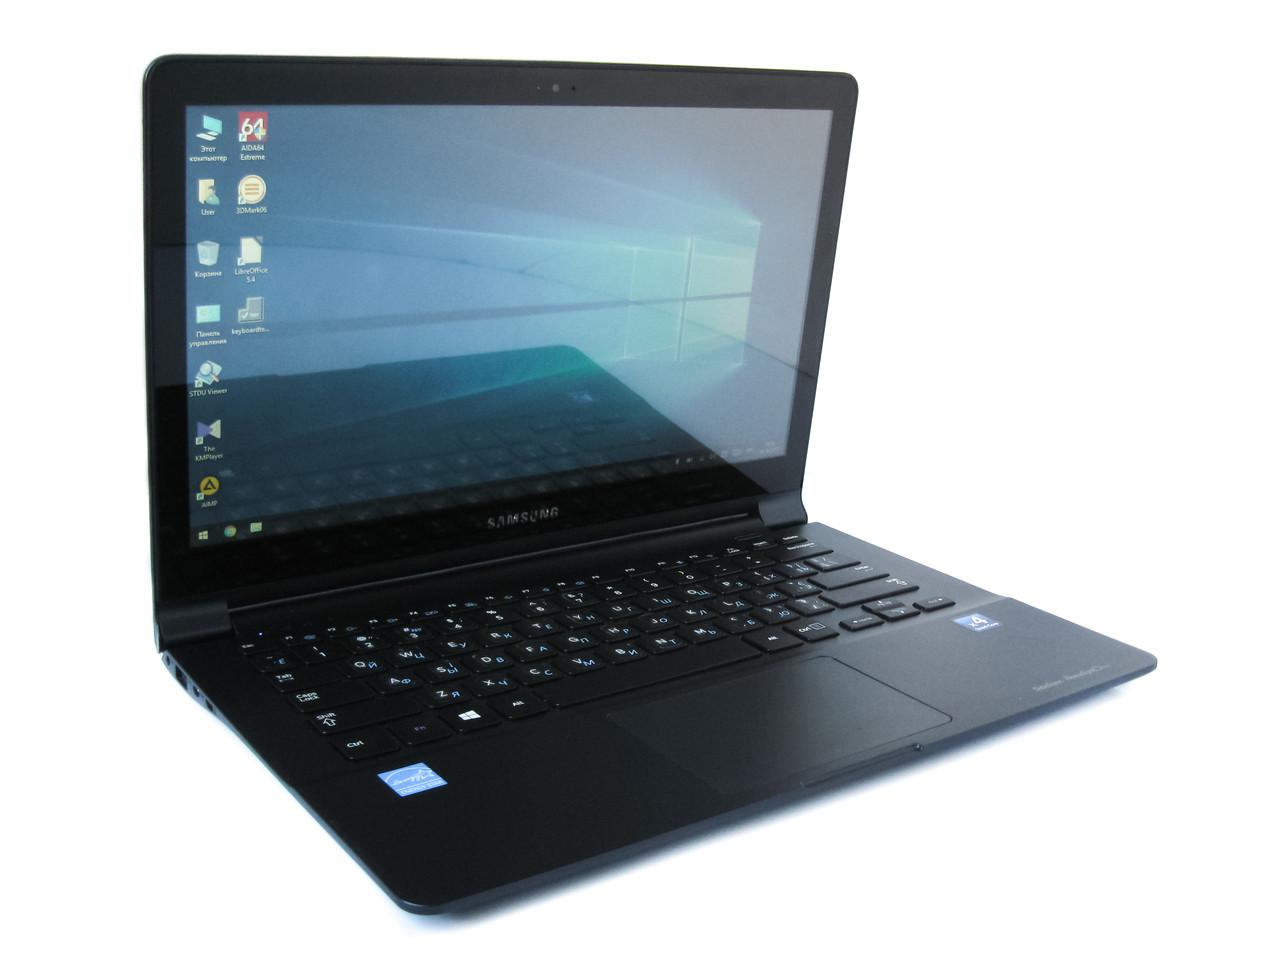 Сенсорный ультрабук Samsung NP915S3G 13.3 (1366x768) / AMD A6-1450 (4x